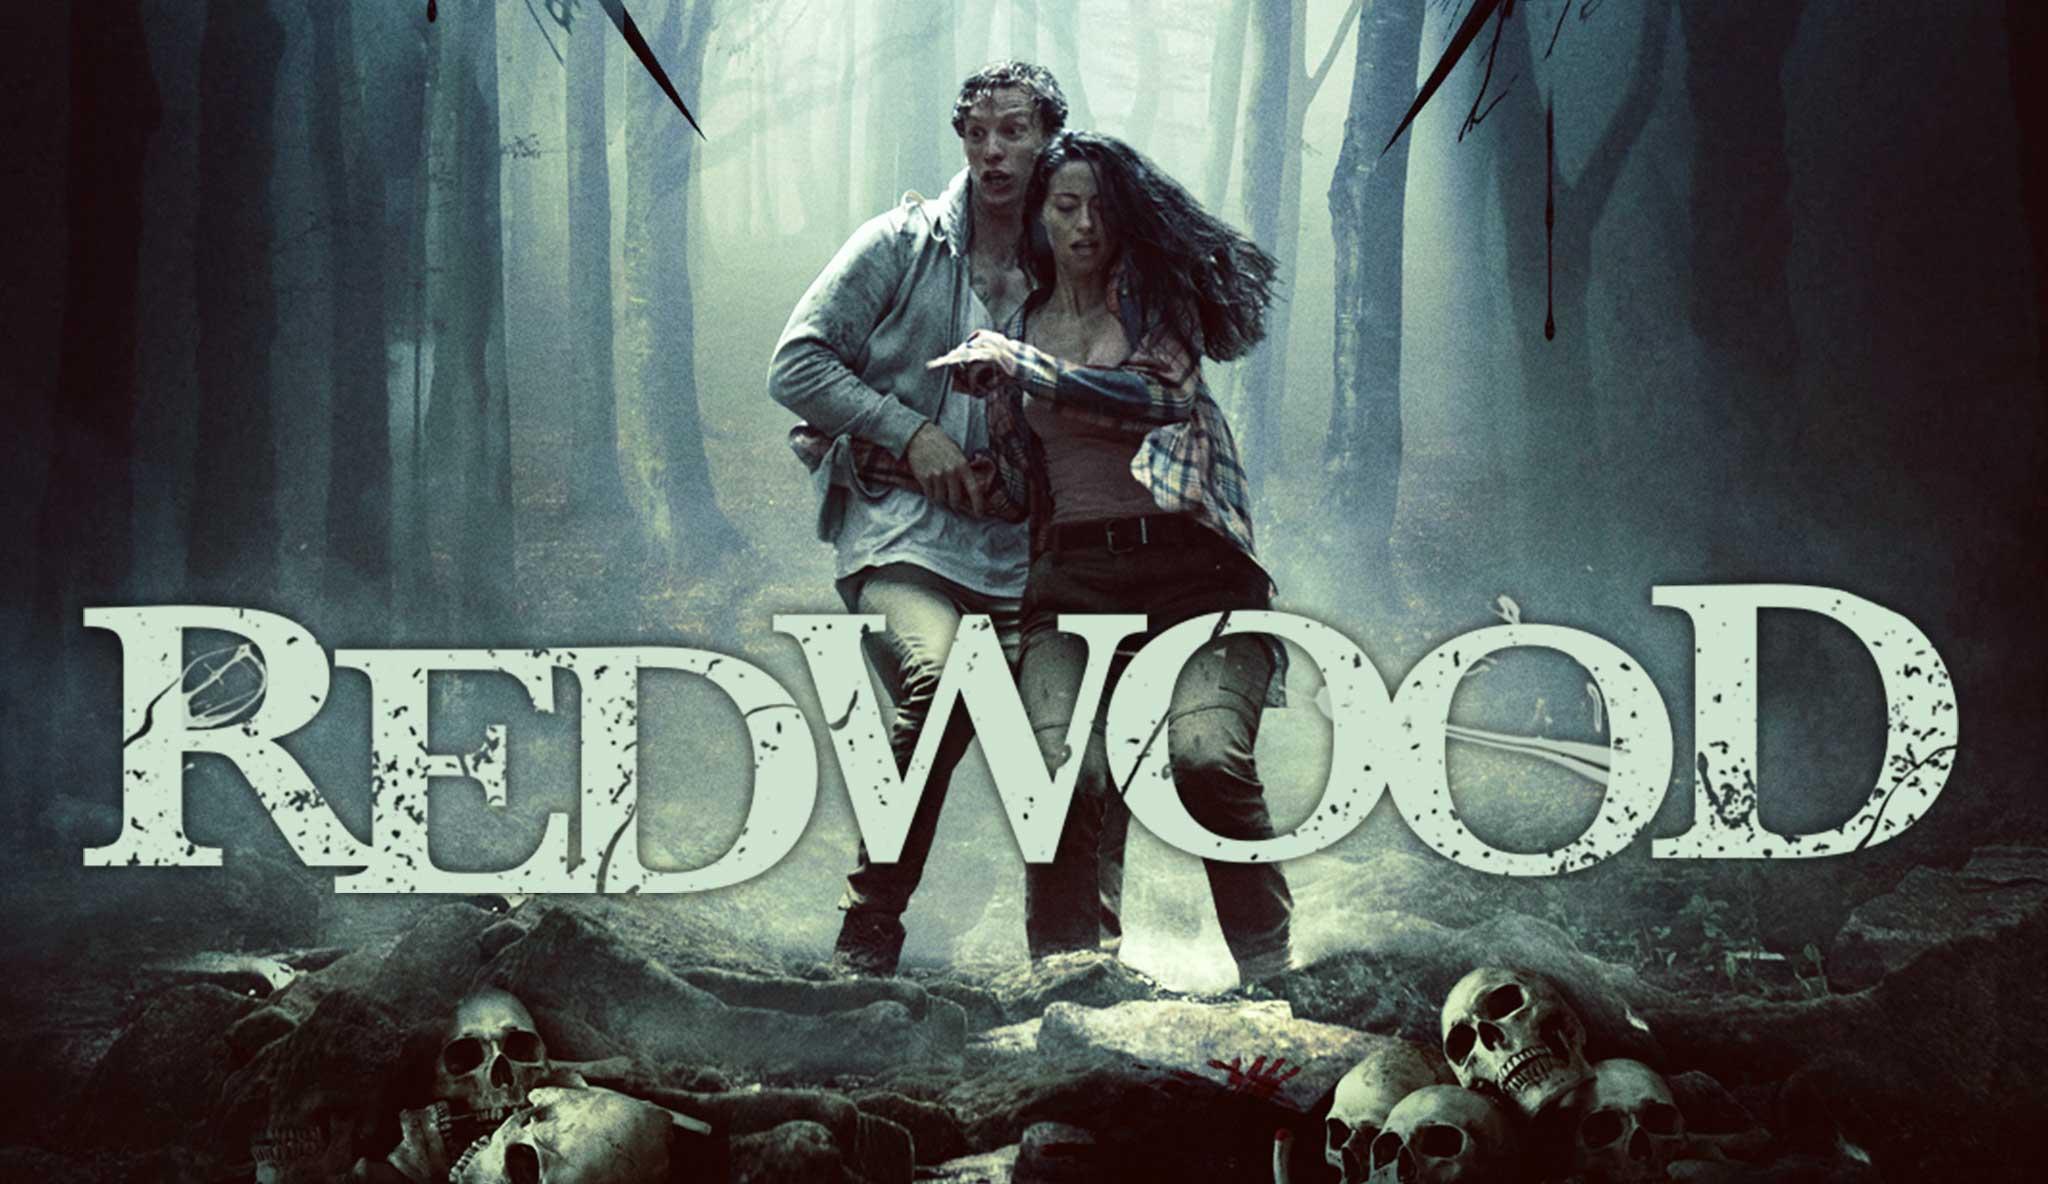 redwood\header.jpg